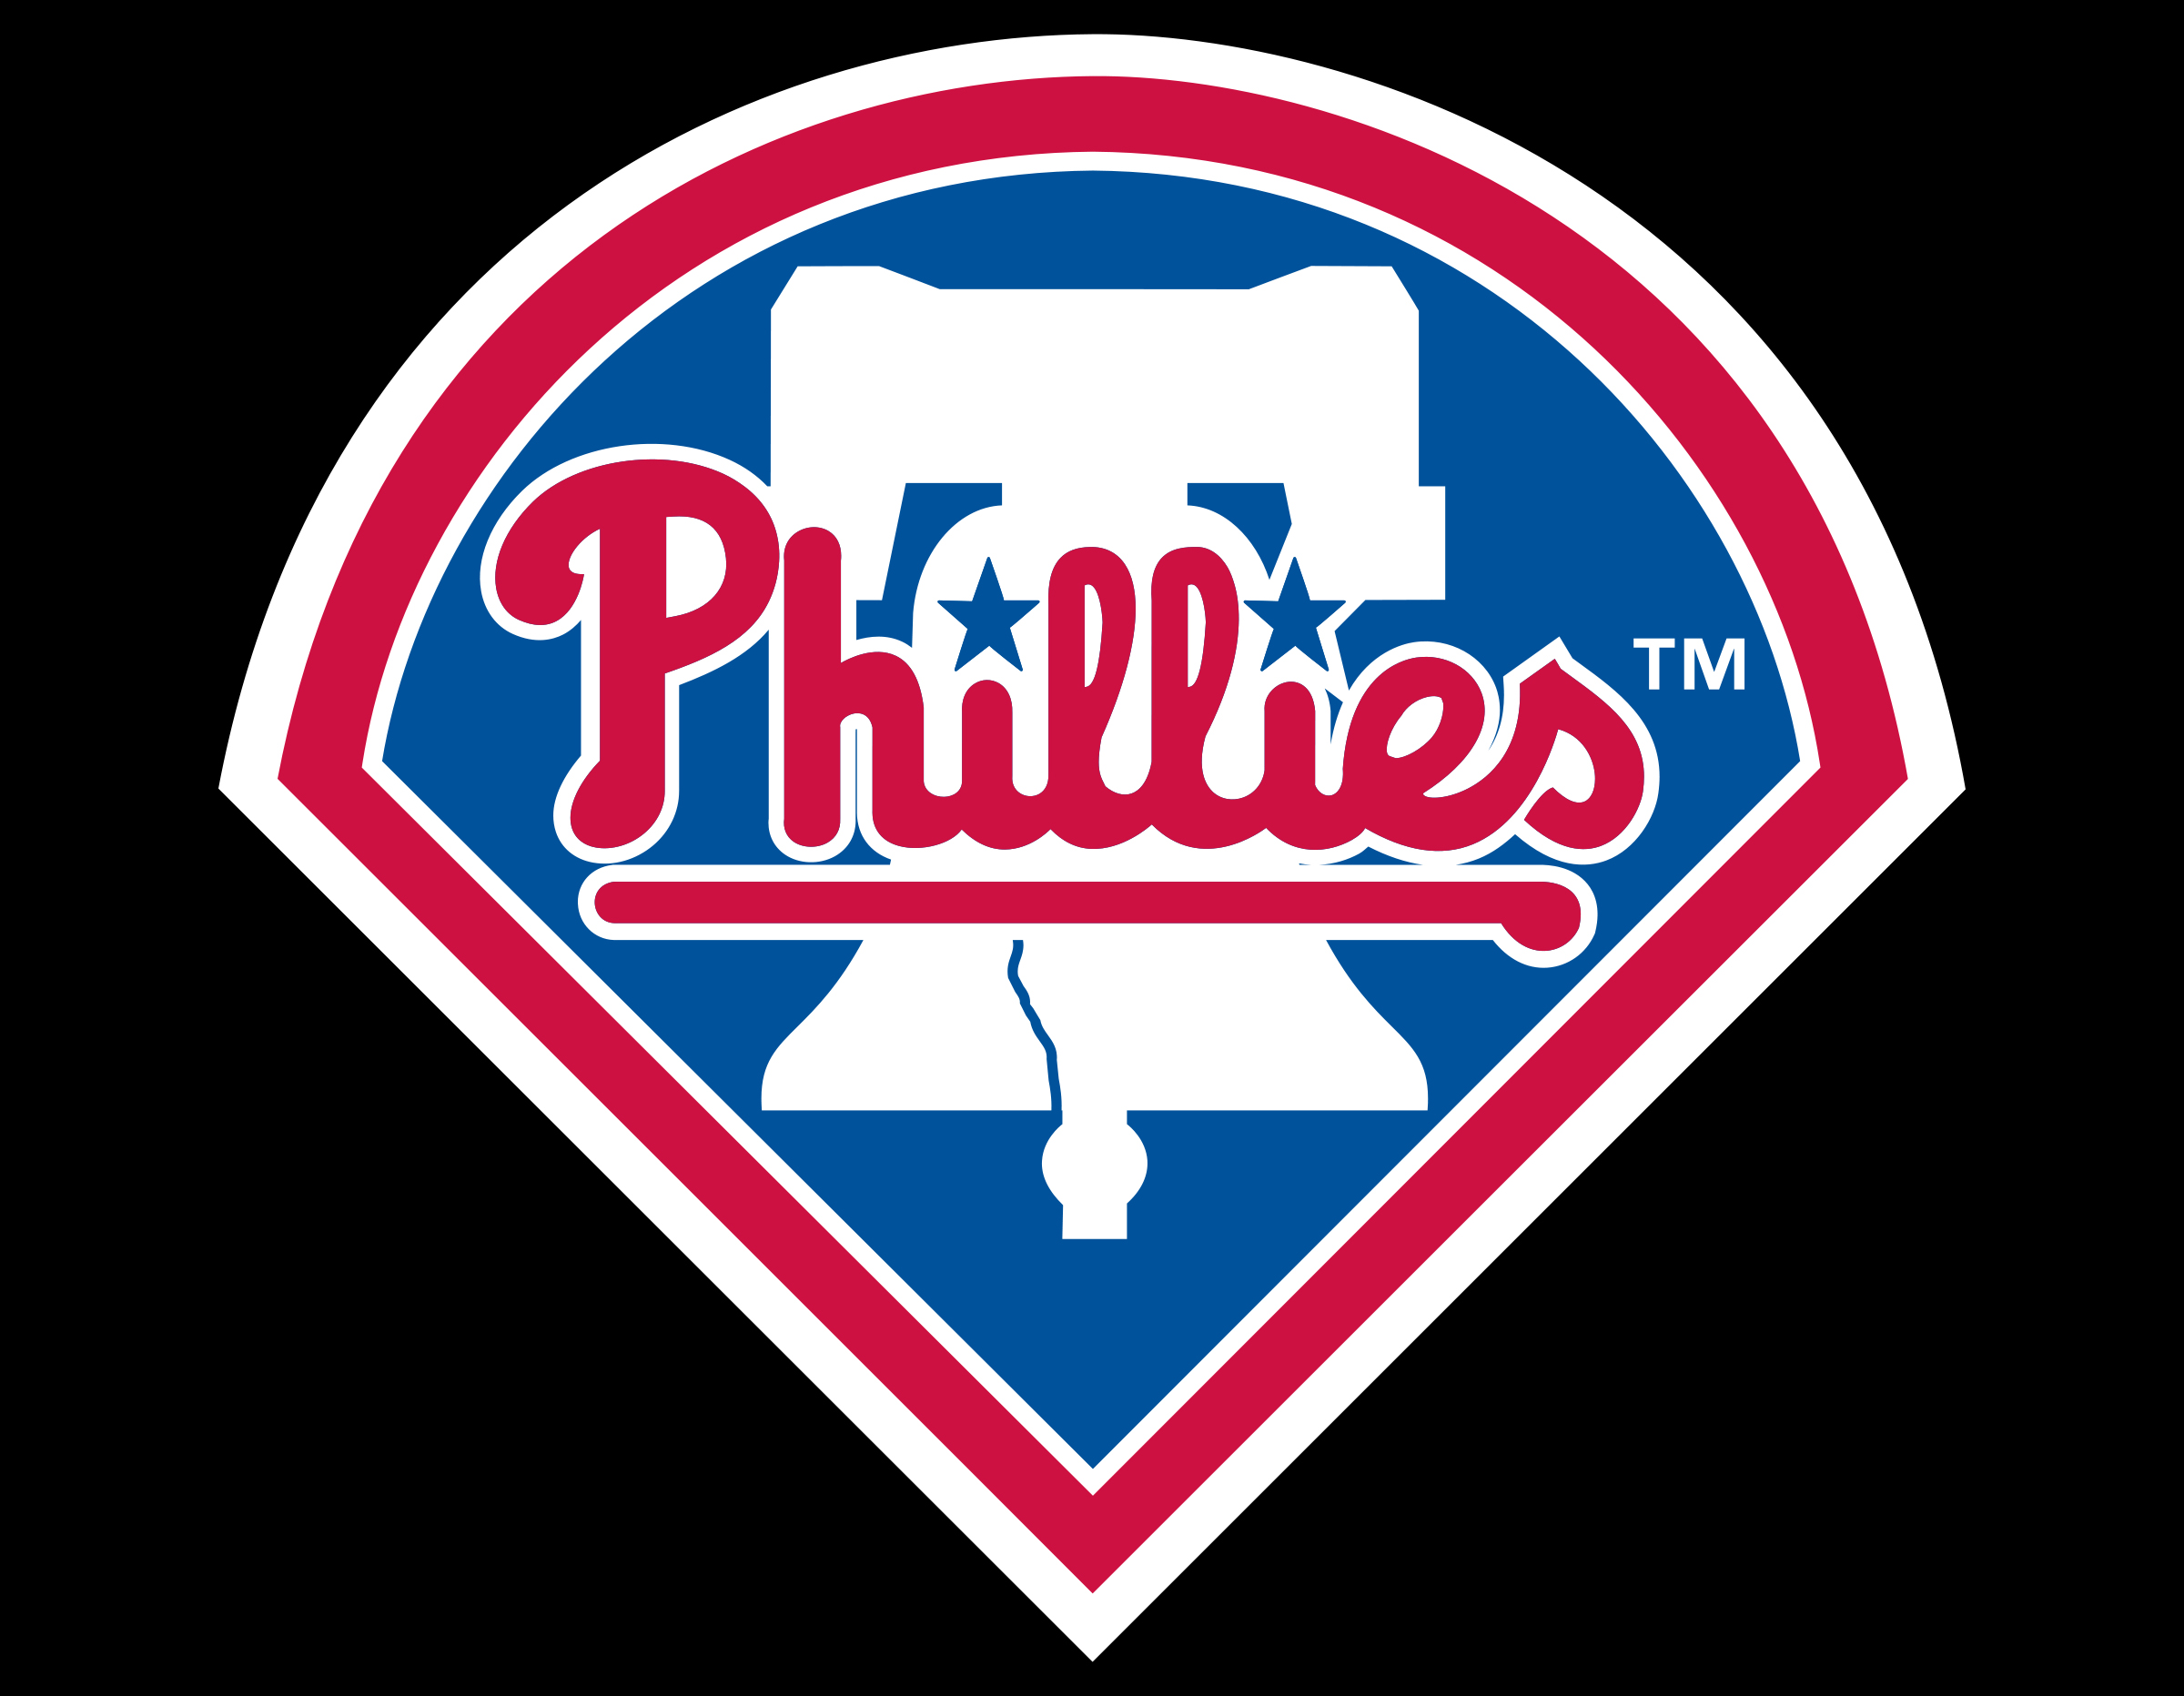 Meaning Philadelphia Phillies logo and symbol.